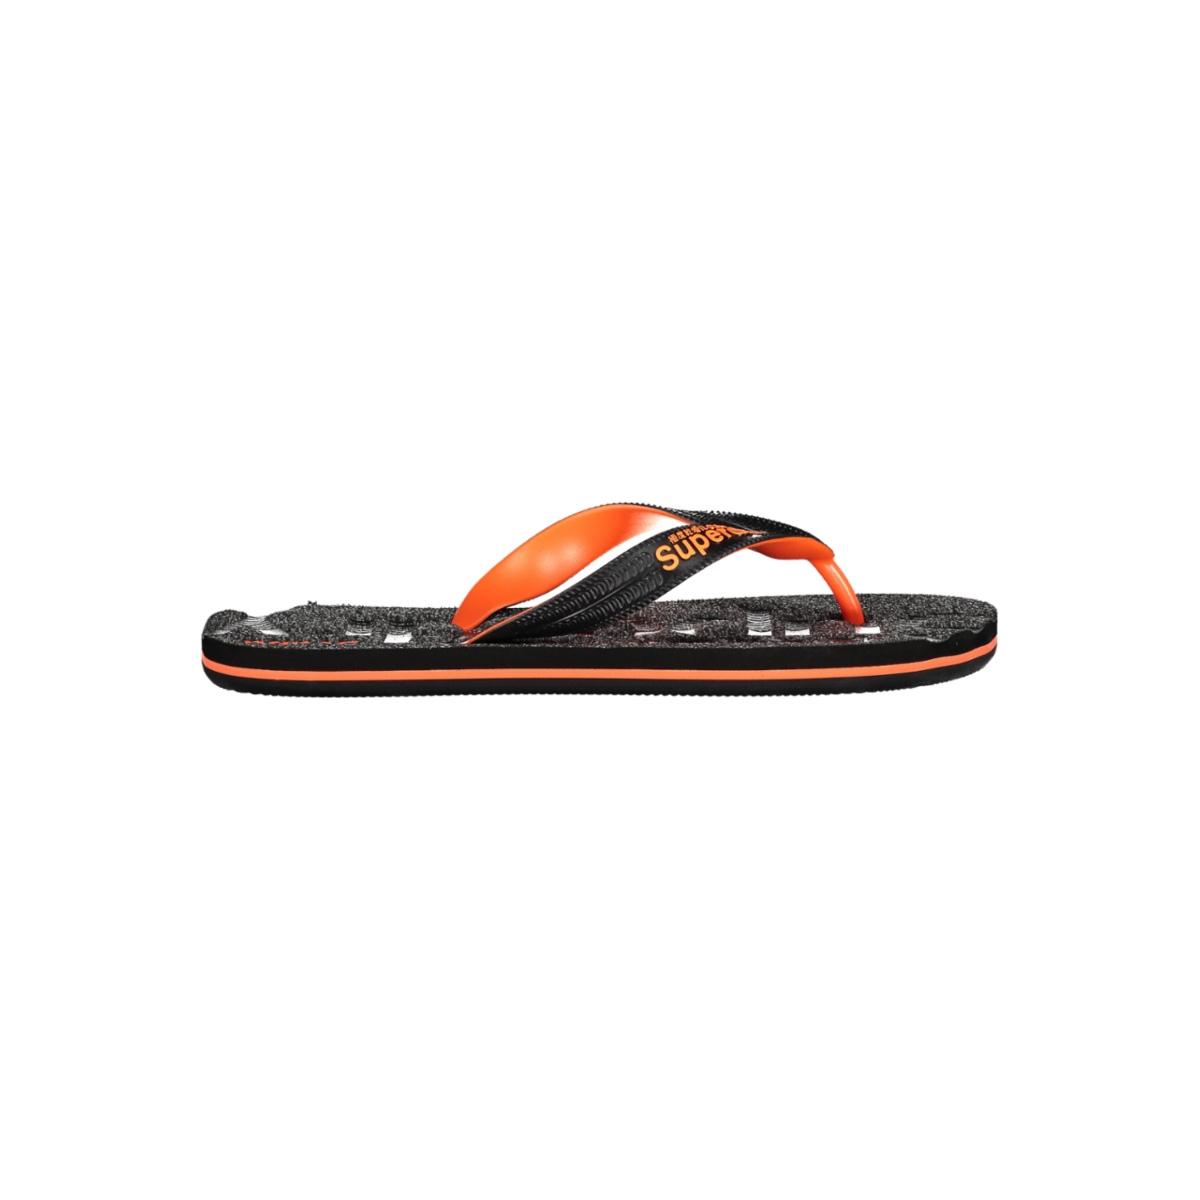 scuba grit flip flop mf310009a superdry slipper black grit